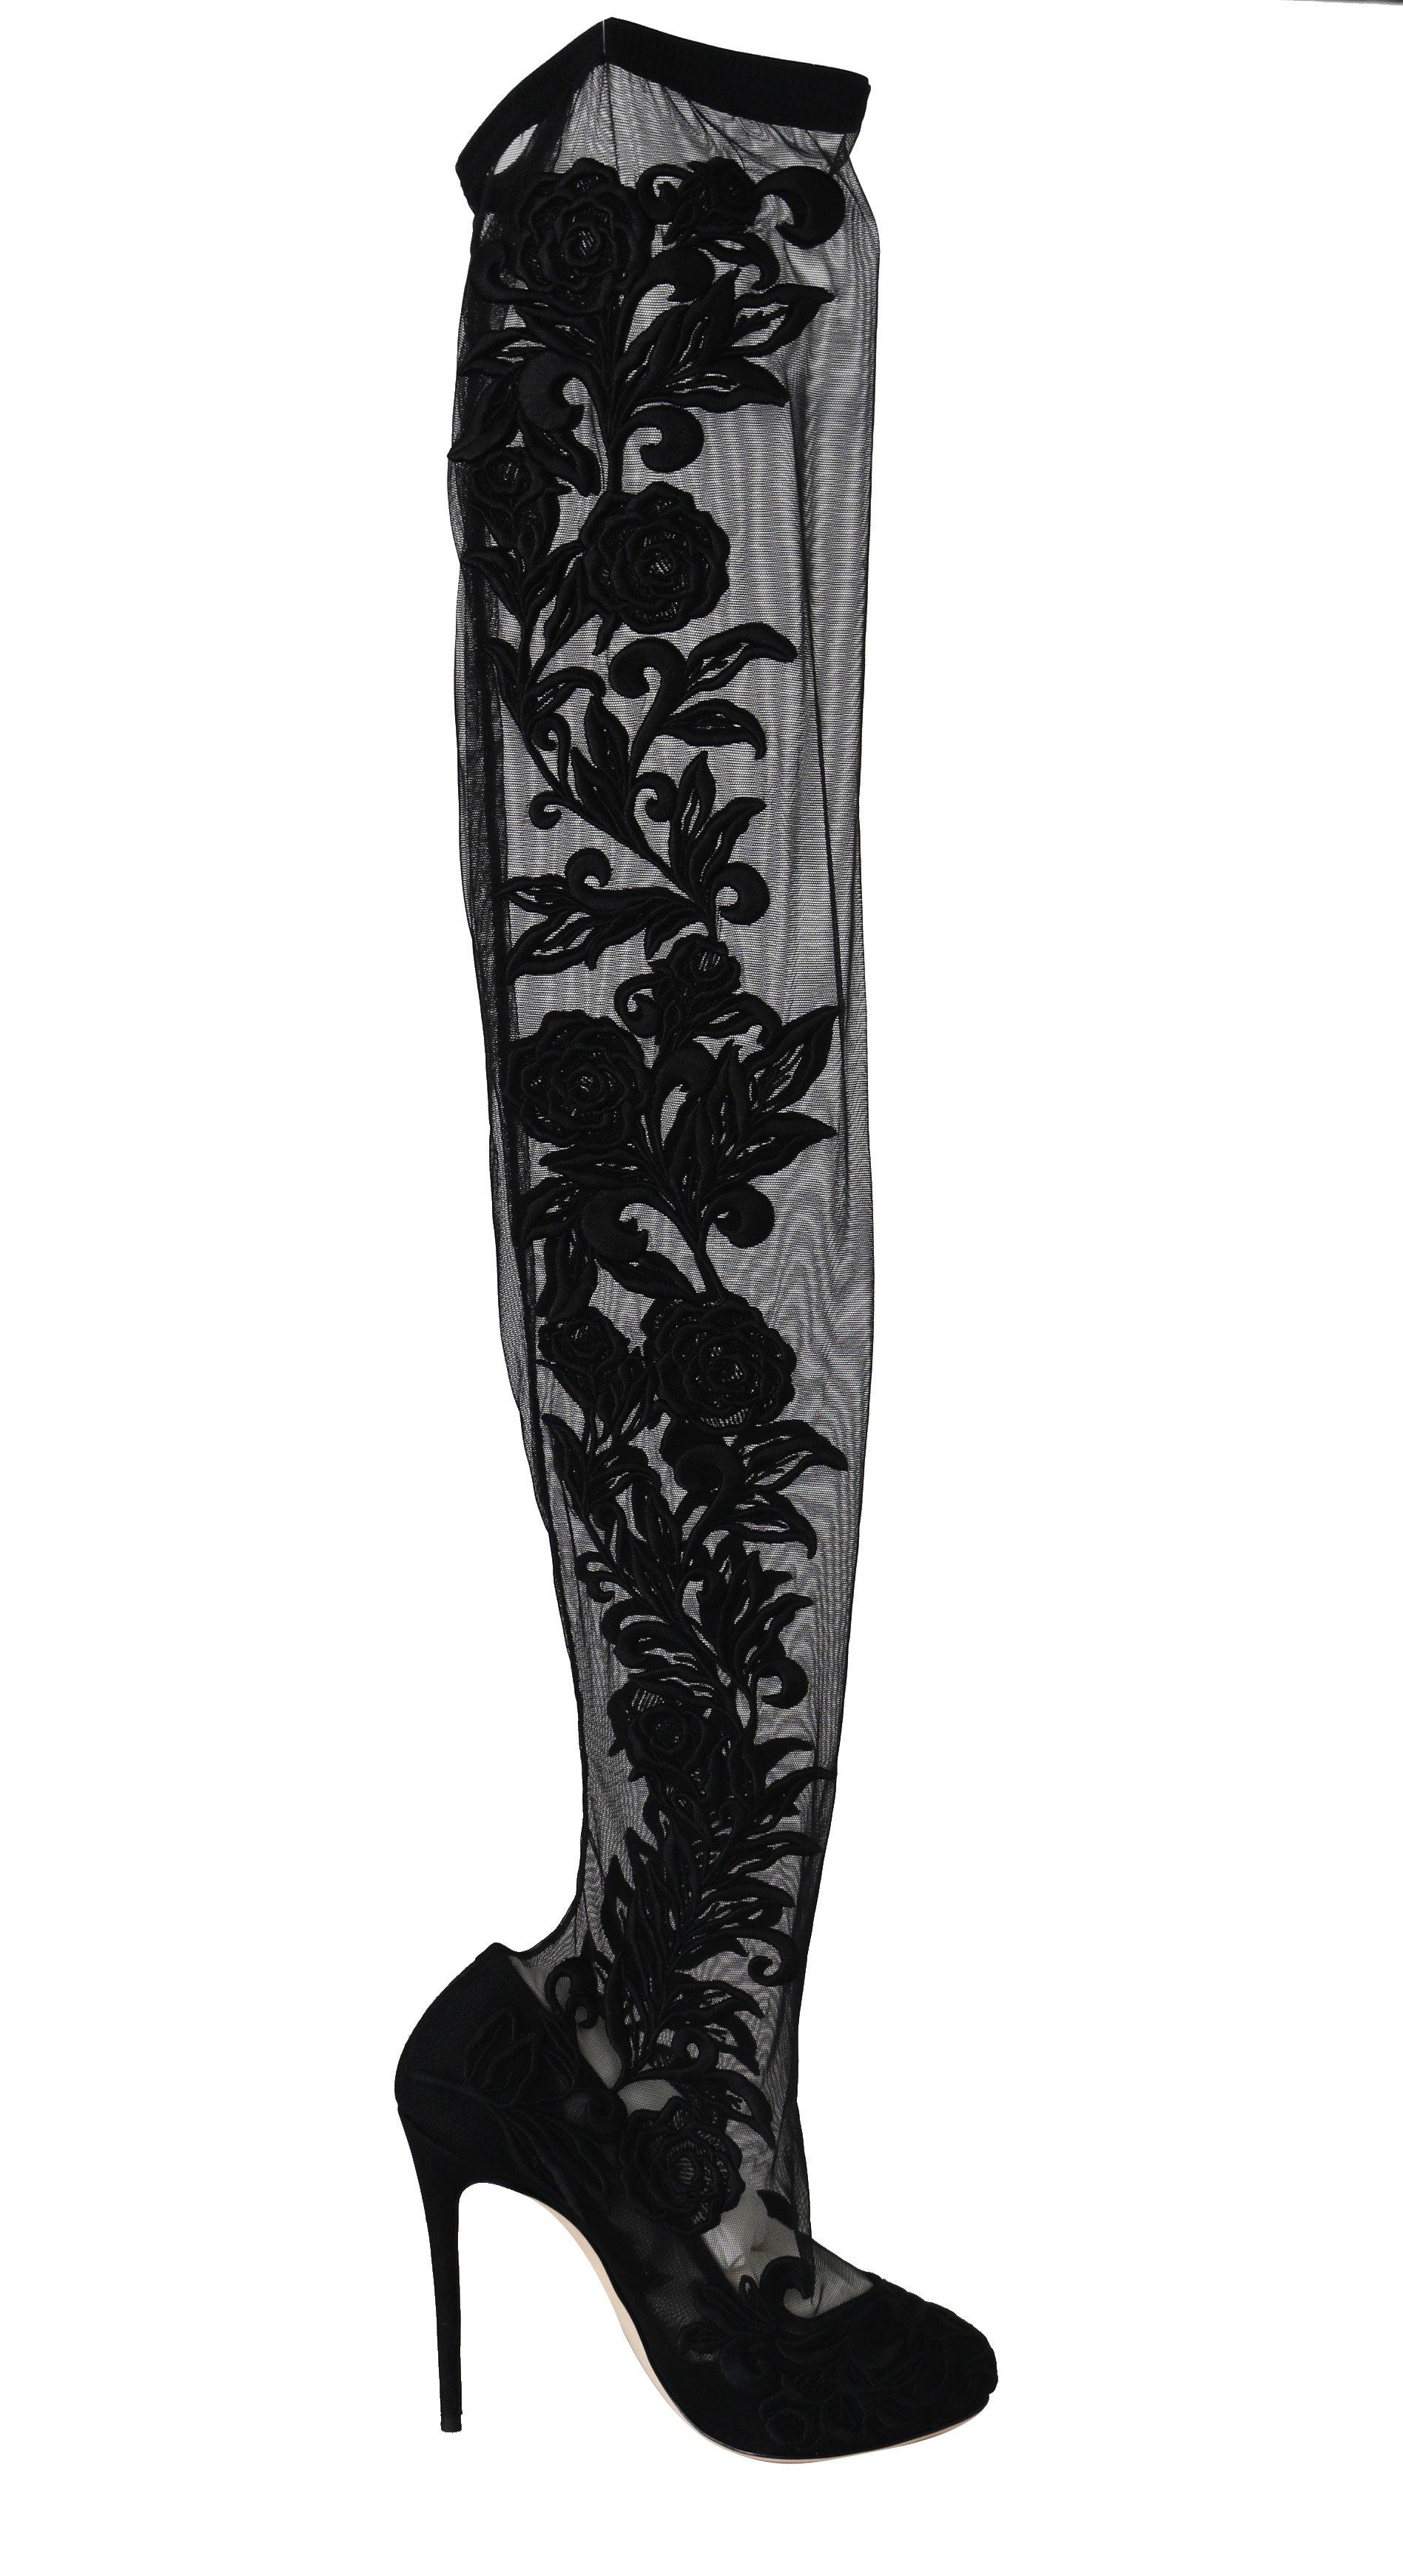 Dolce & Gabbana Women's Floral Lace Booties Heels Black LA5687 - EU38.5/US8